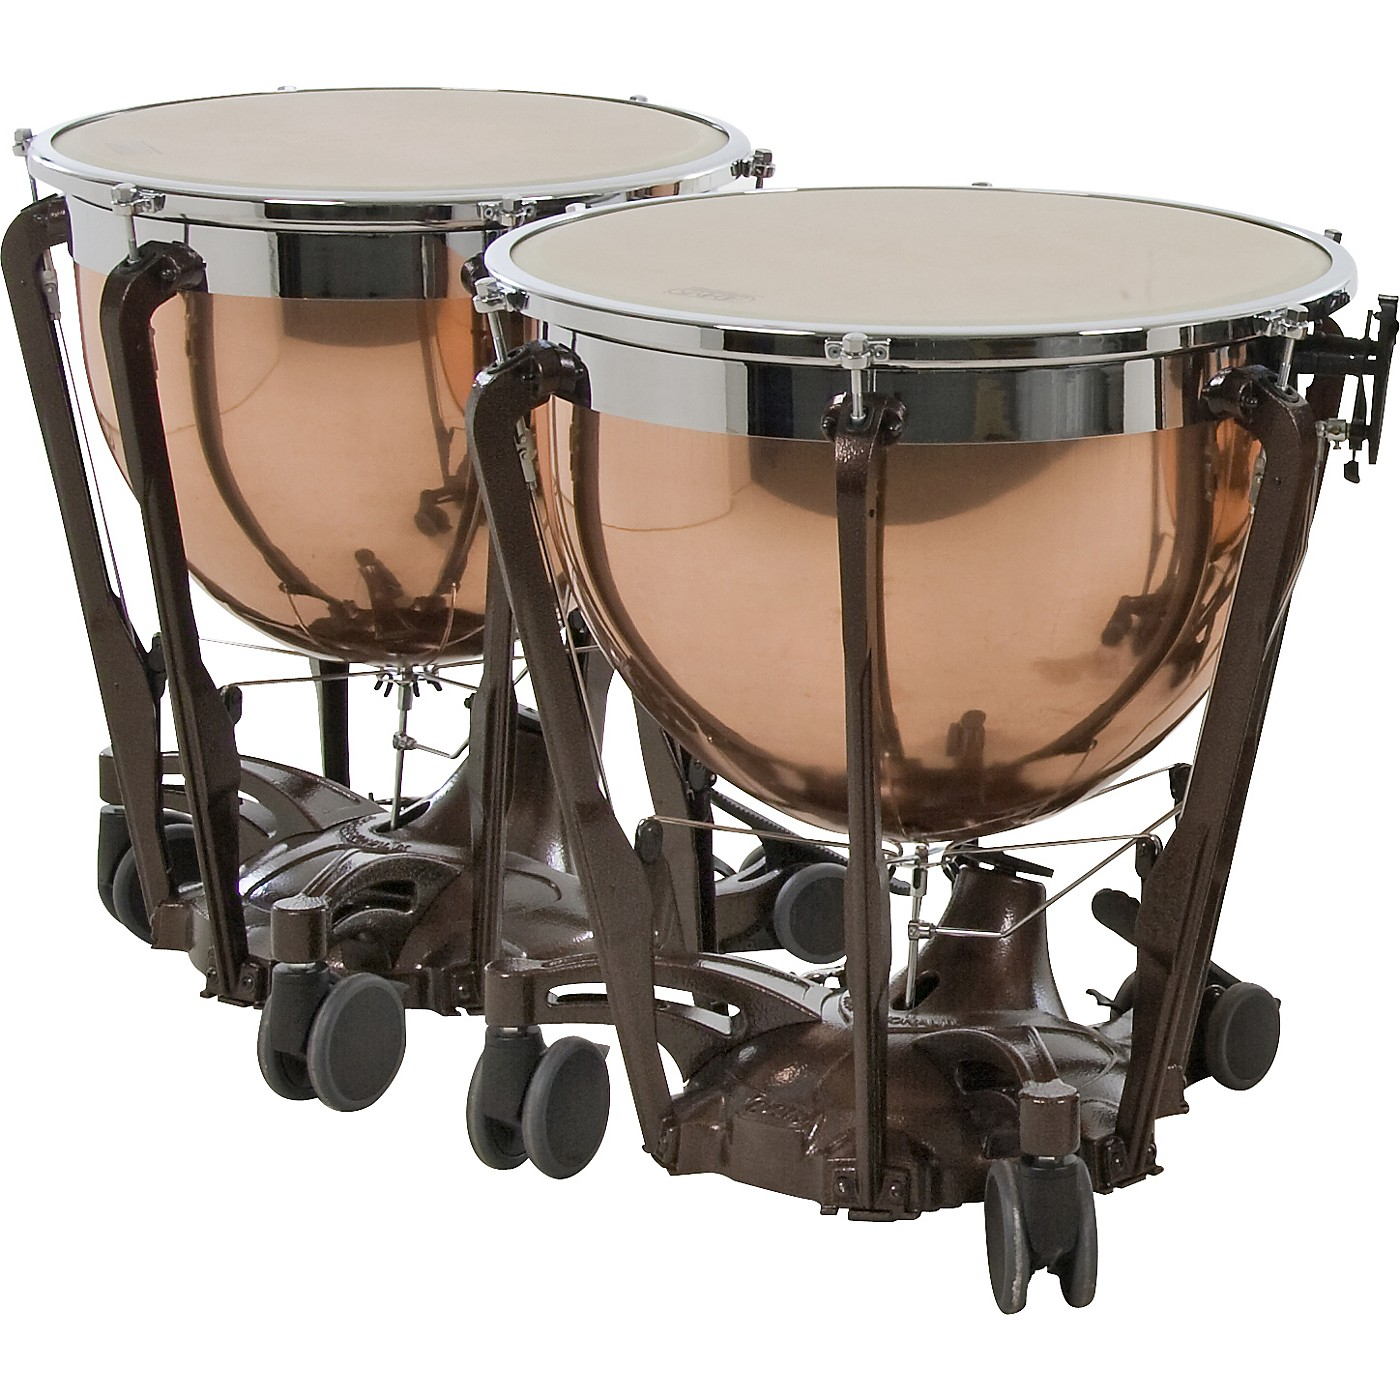 Adams Professional Series Generation II Polished Copper Timpani, Set of 2 thumbnail